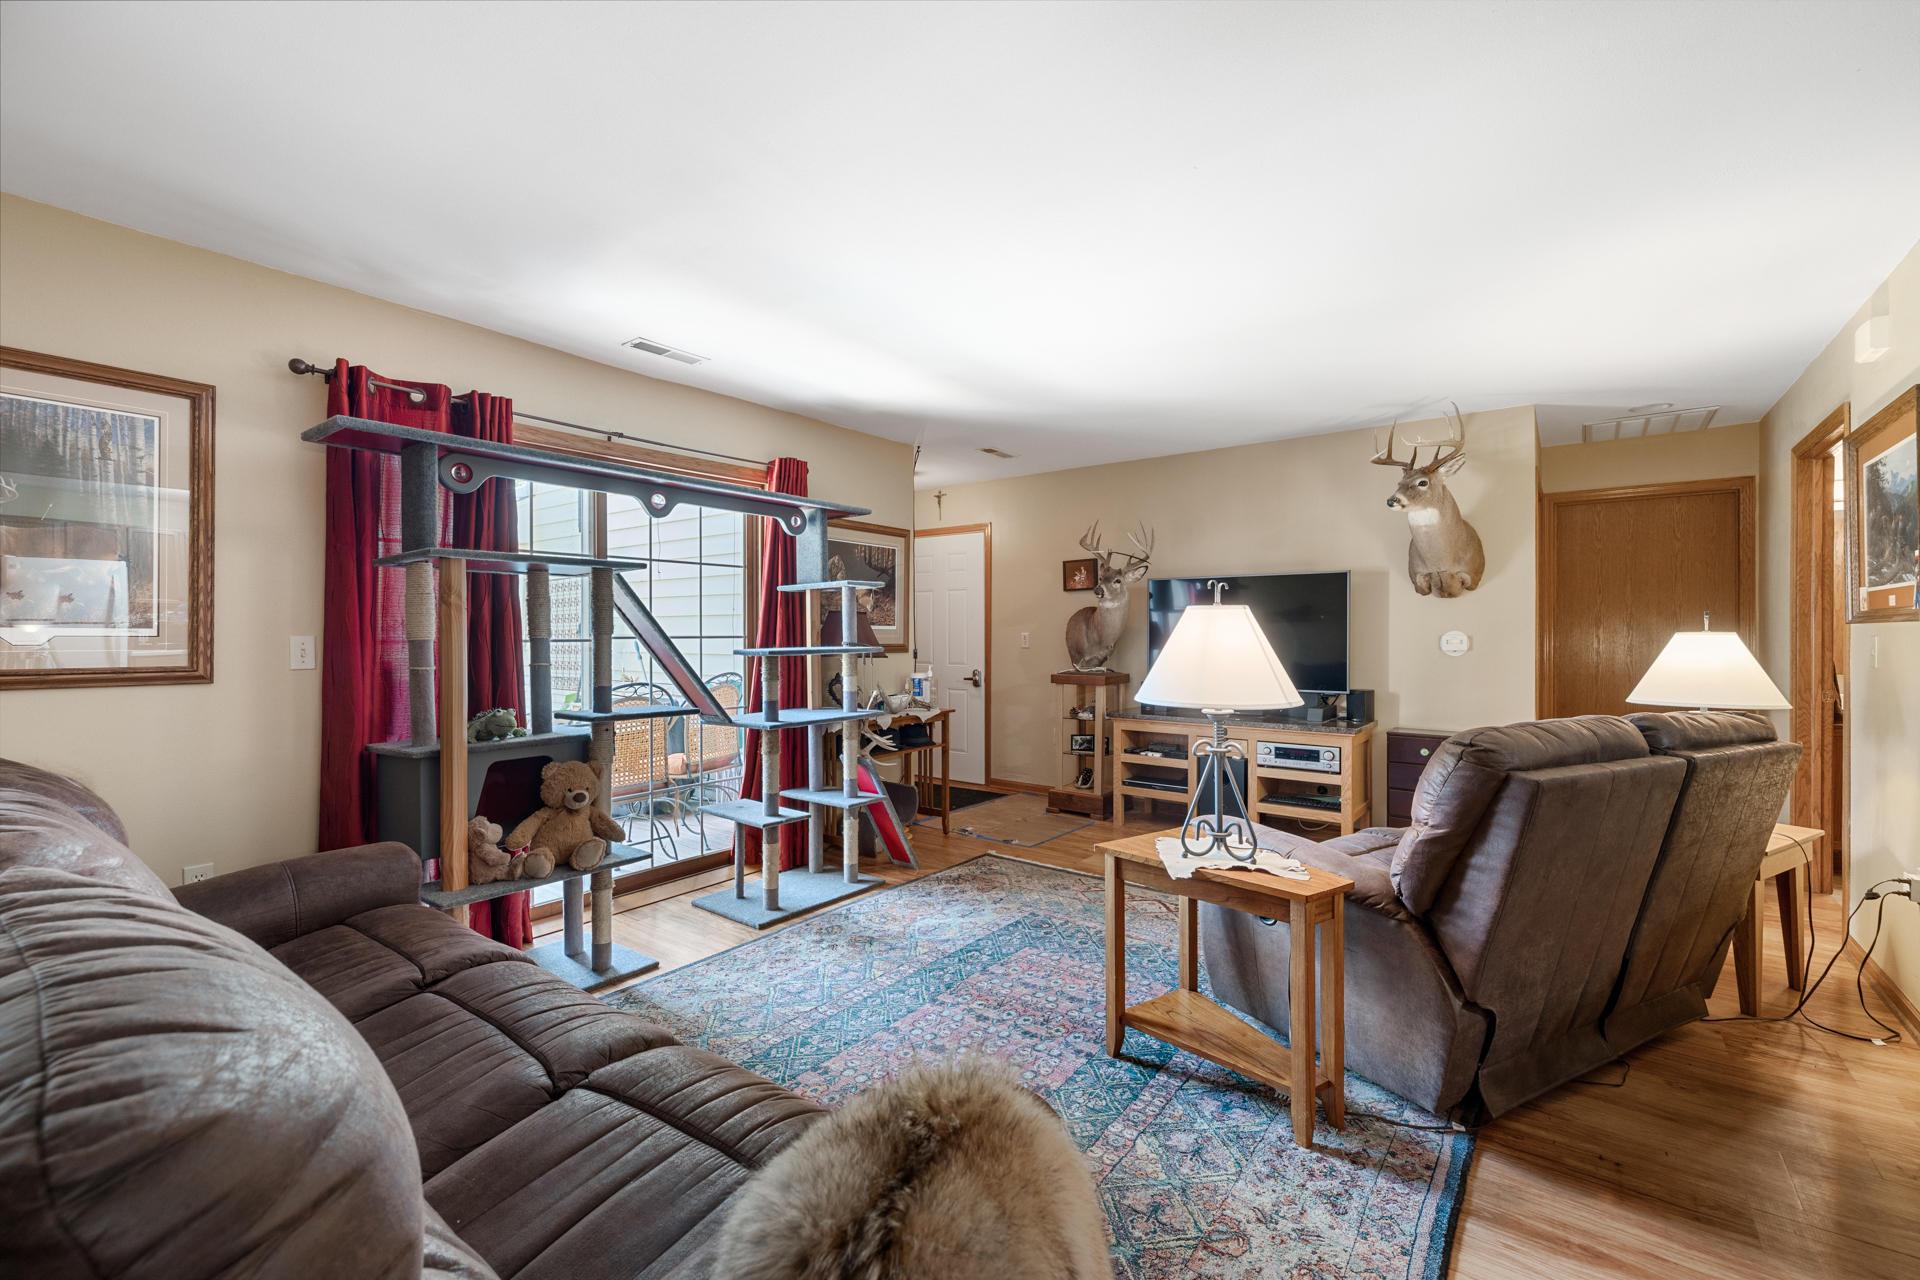 W240N2510 Parkway Meadow Cir, Pewaukee, Wisconsin 53072, 2 Bedrooms Bedrooms, ,2 BathroomsBathrooms,Condominiums,For Sale,Parkway Meadow Cir,1,1712496